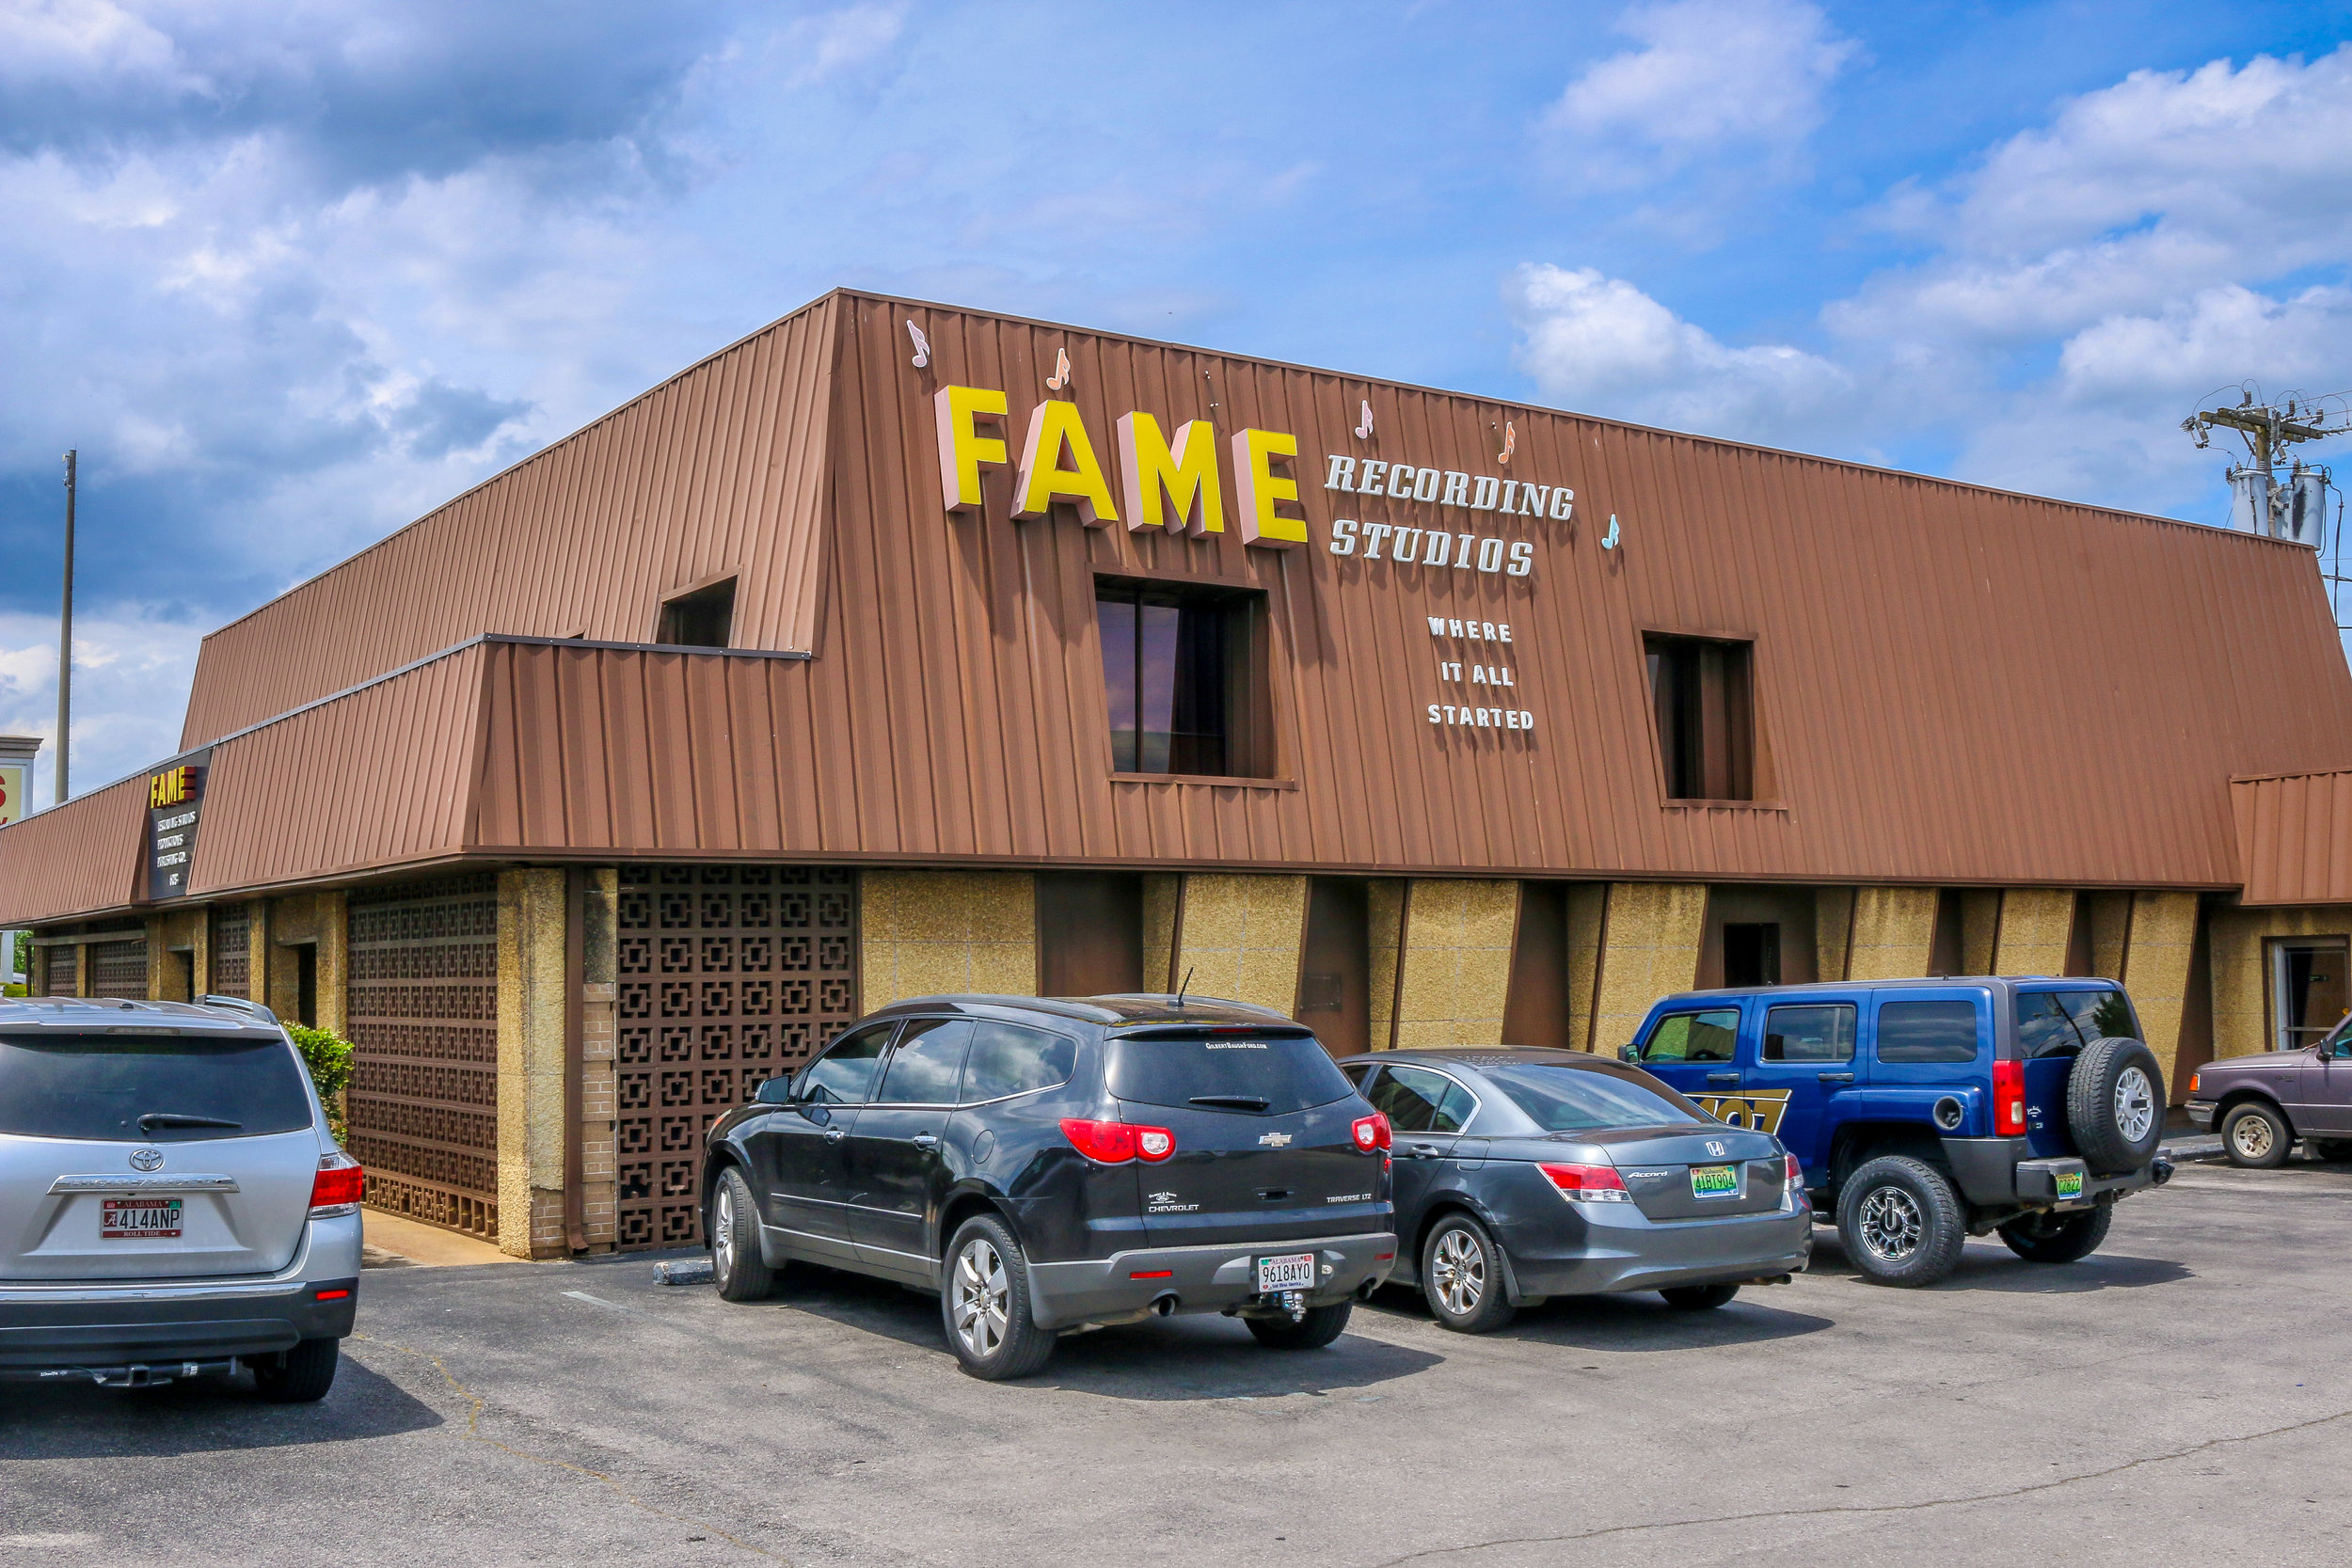 FAME Recording Studio